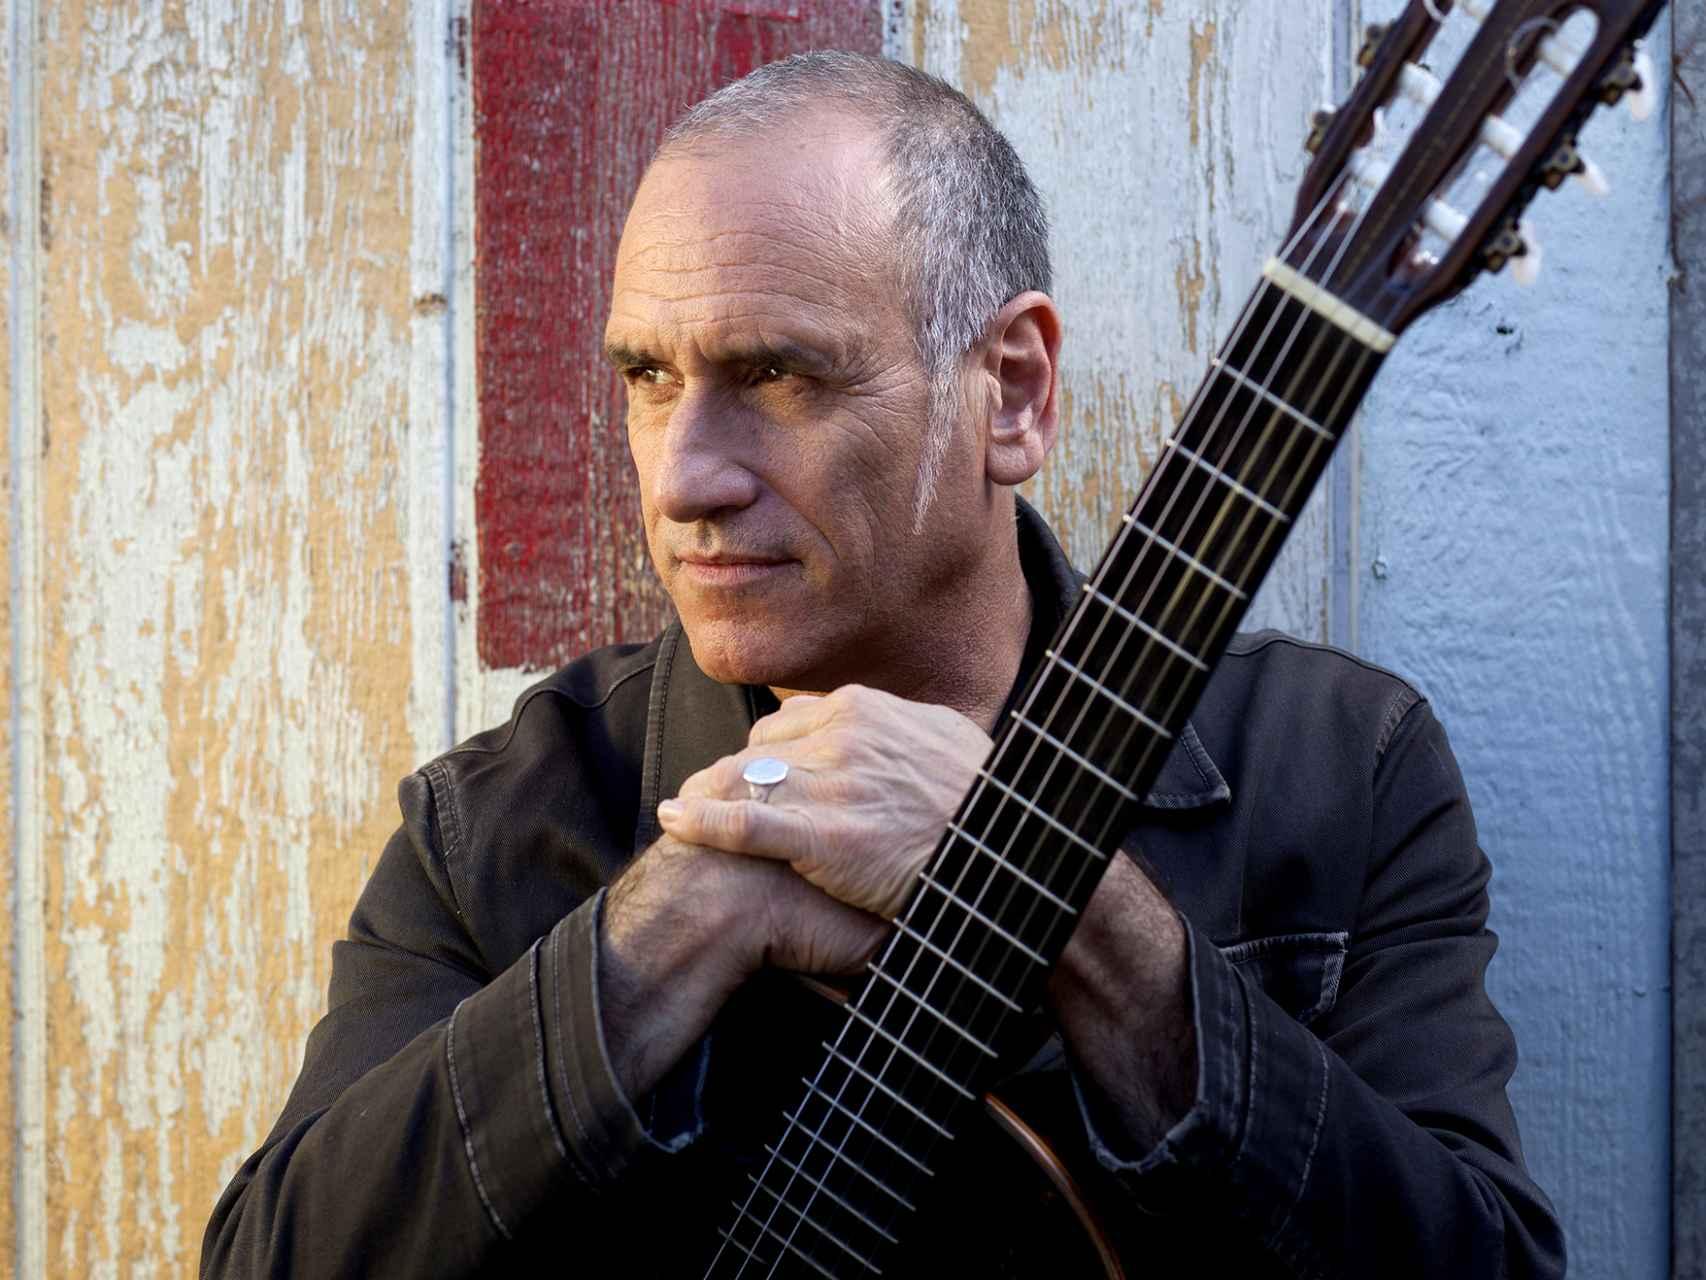 El músico israelí.